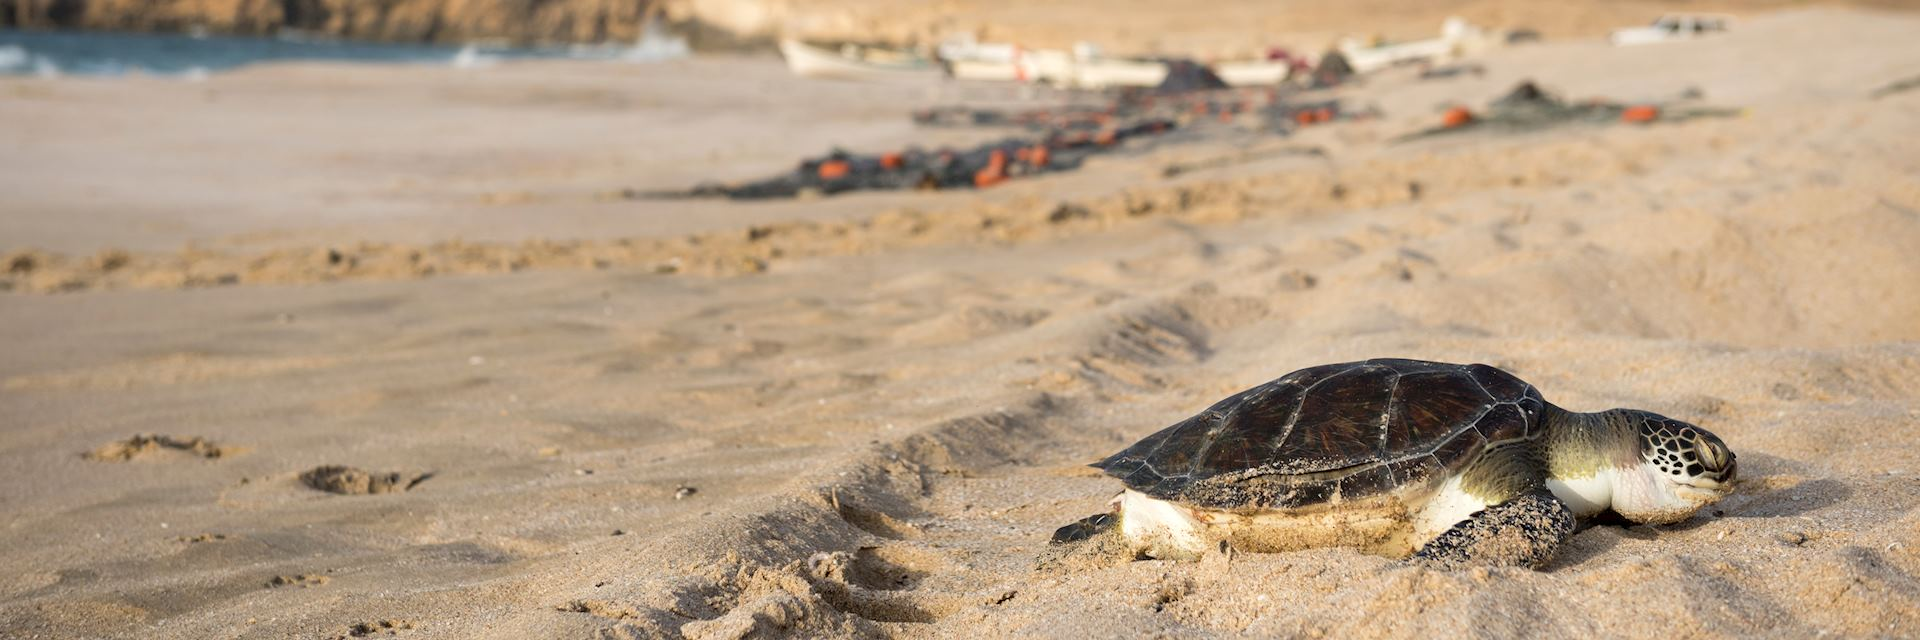 Sea turtle at Raz al Jinz